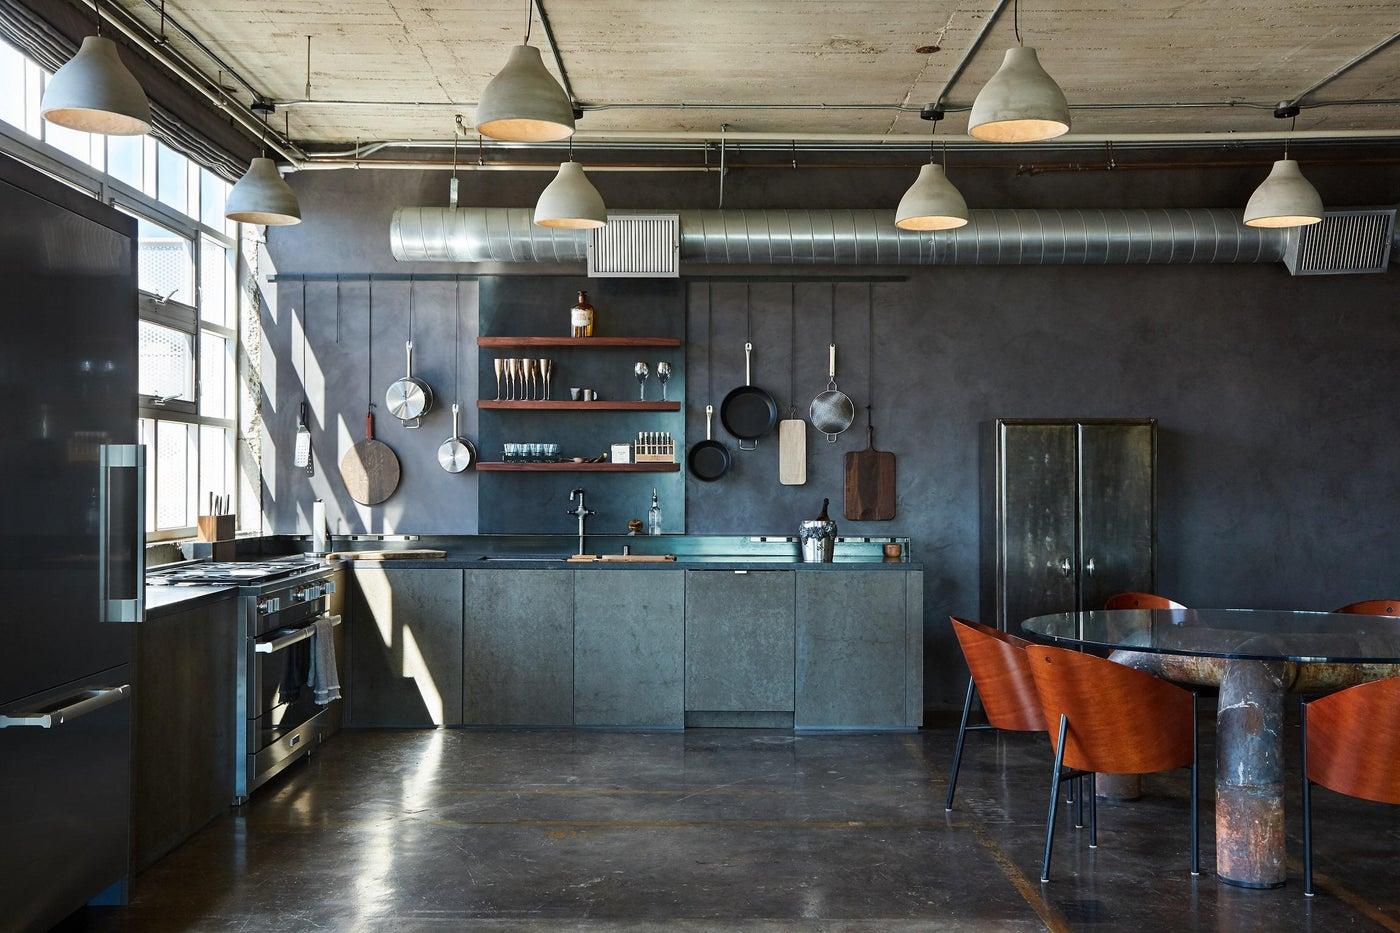 Matte black kitchen counters of Honed Petit Granite & blackened steel backsplash